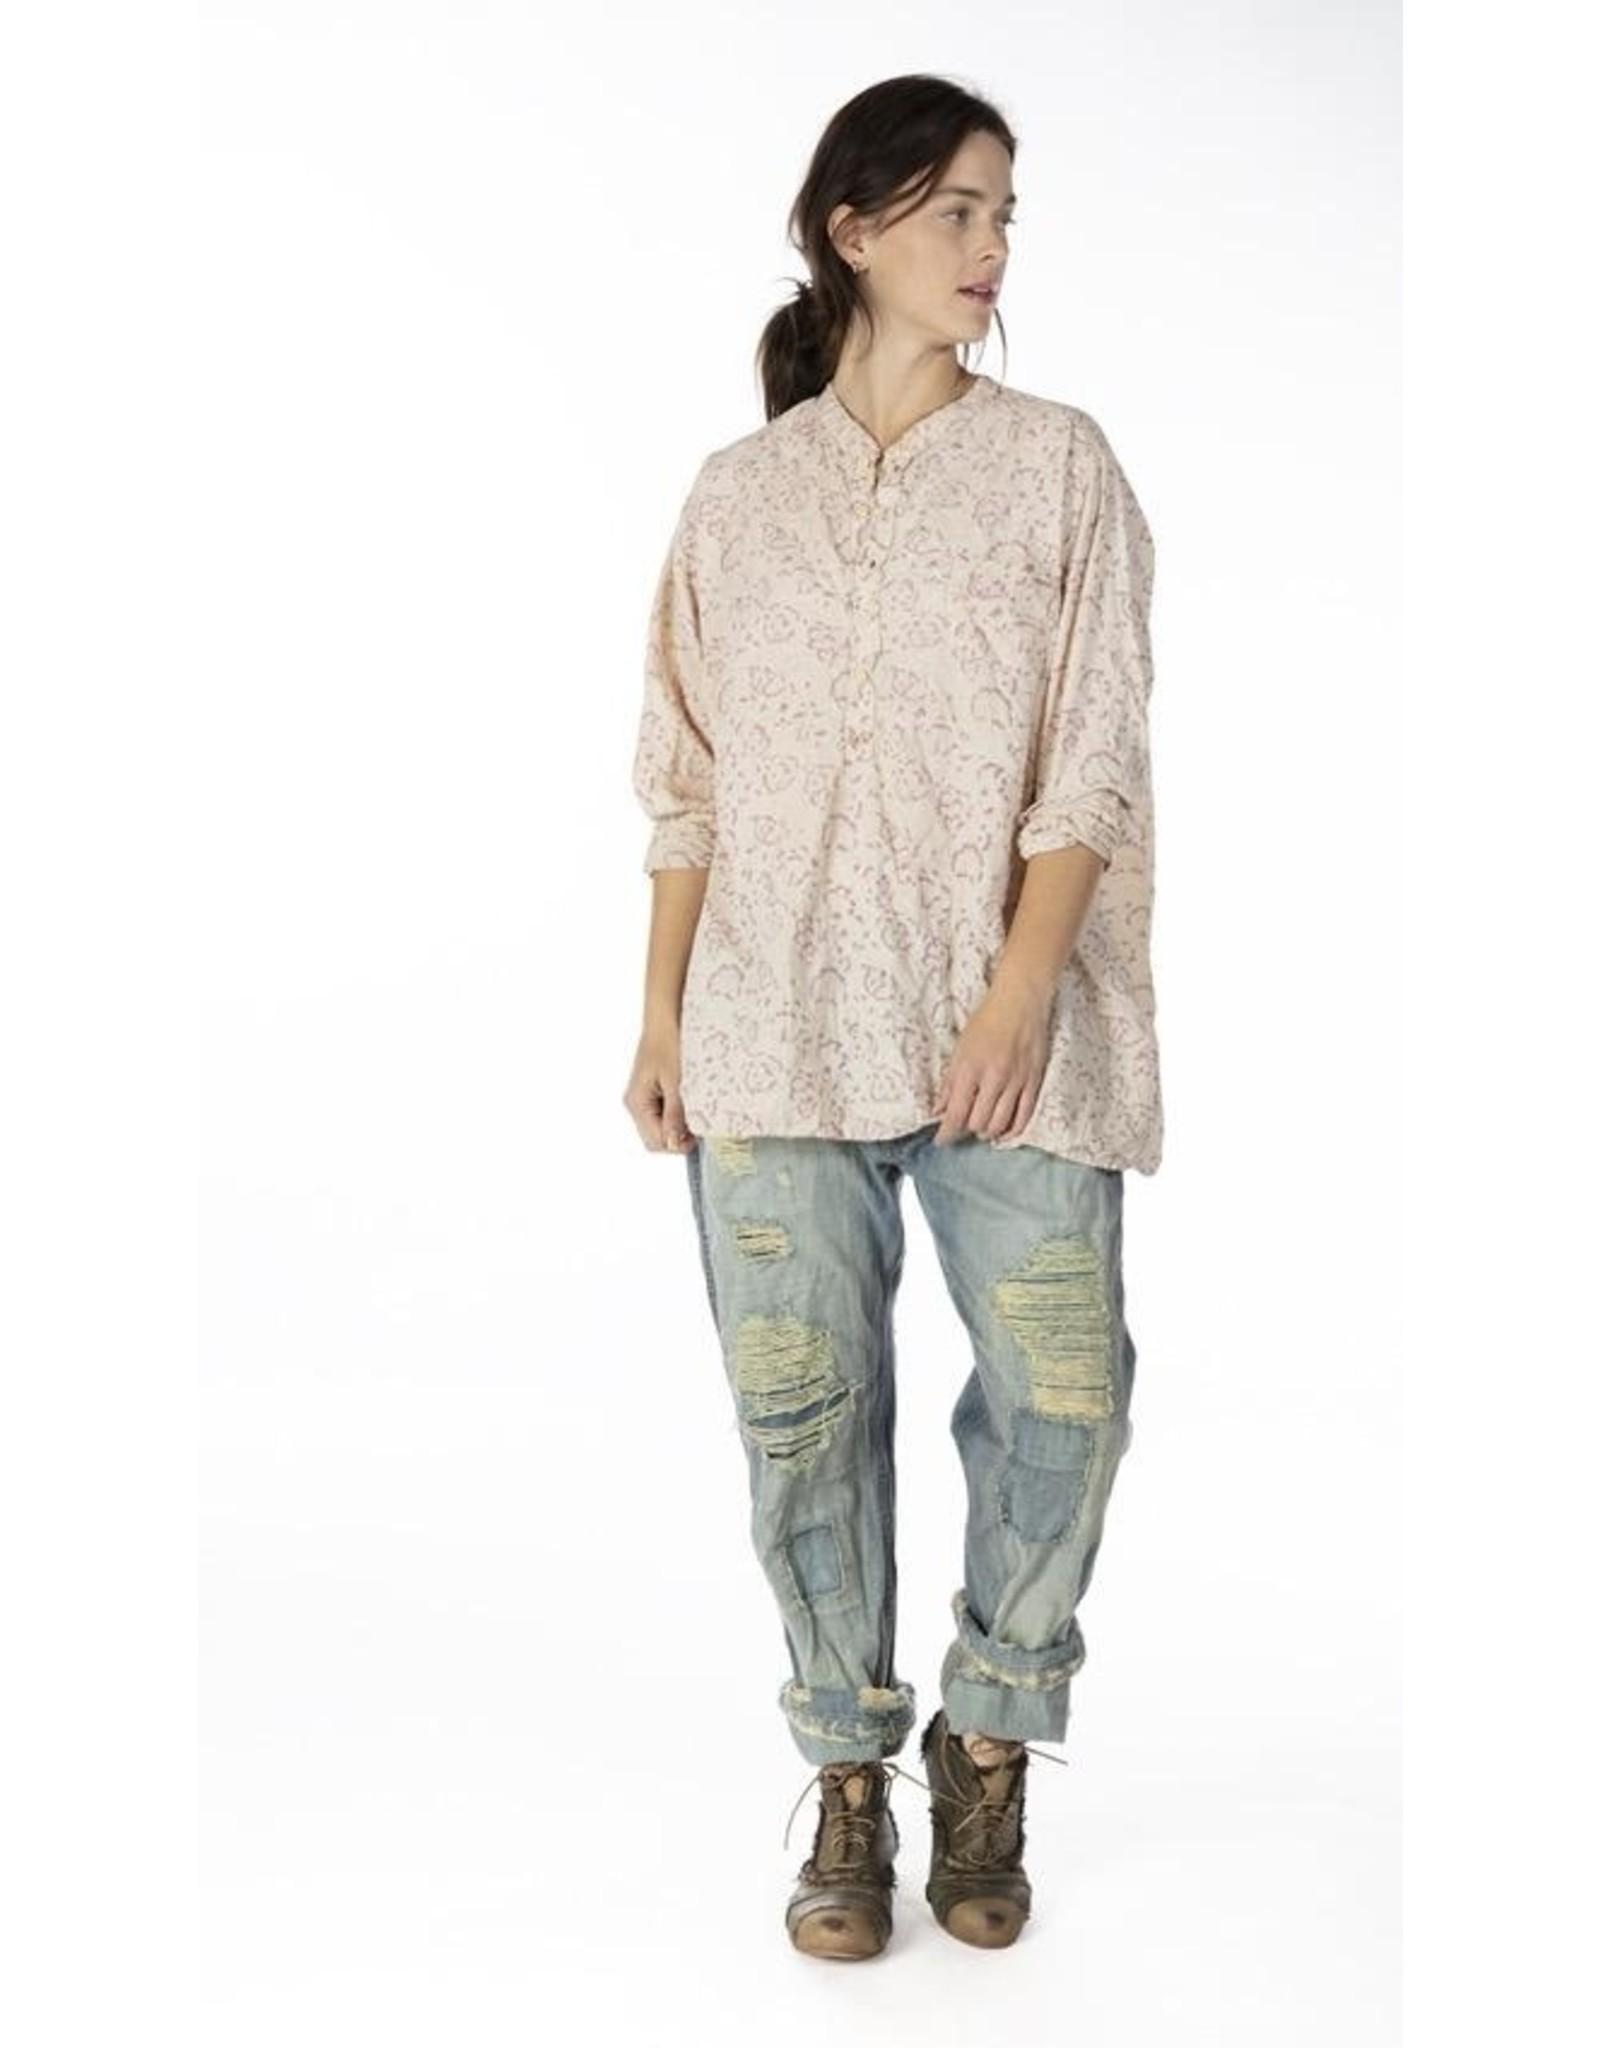 Magnolia Pearl Idgy Mens Shirt - Alana